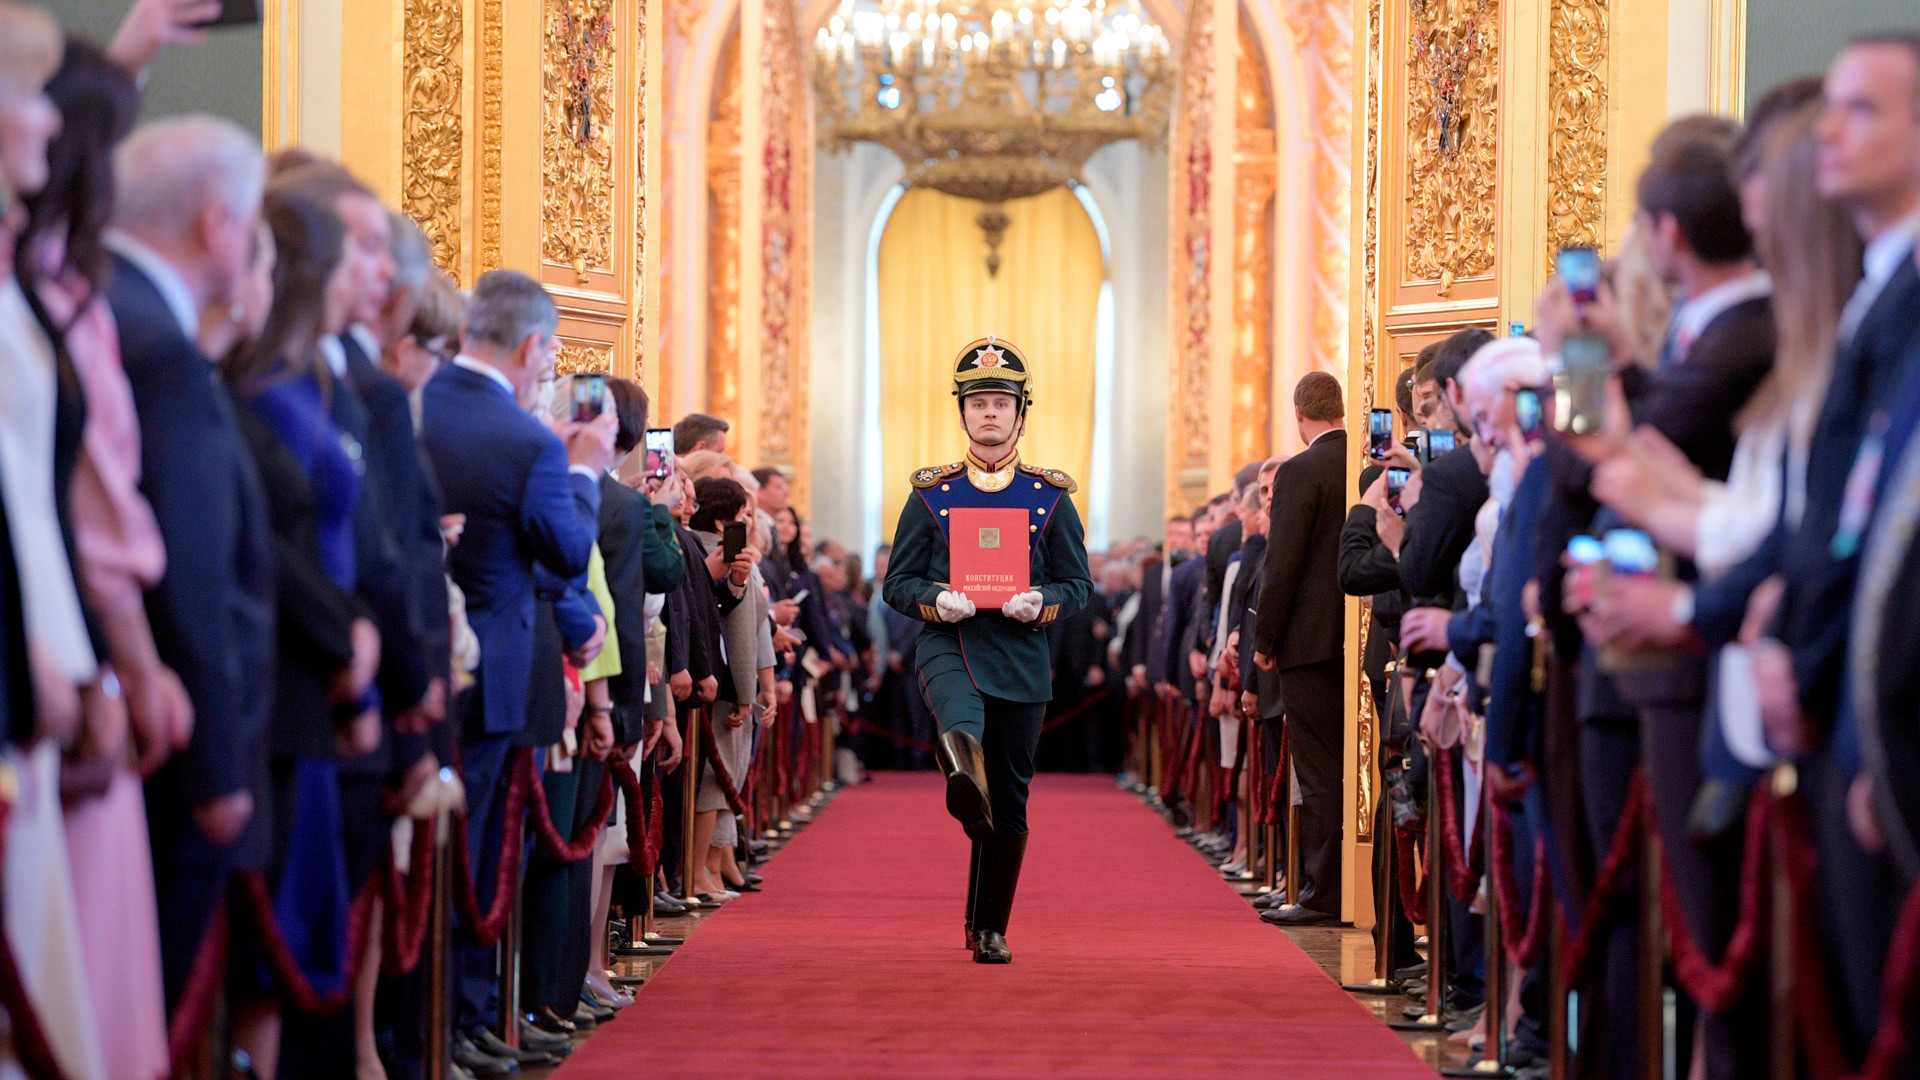 <p>Фото: &copy;&nbsp;РИА Новости/Алексей Дружинин</p>